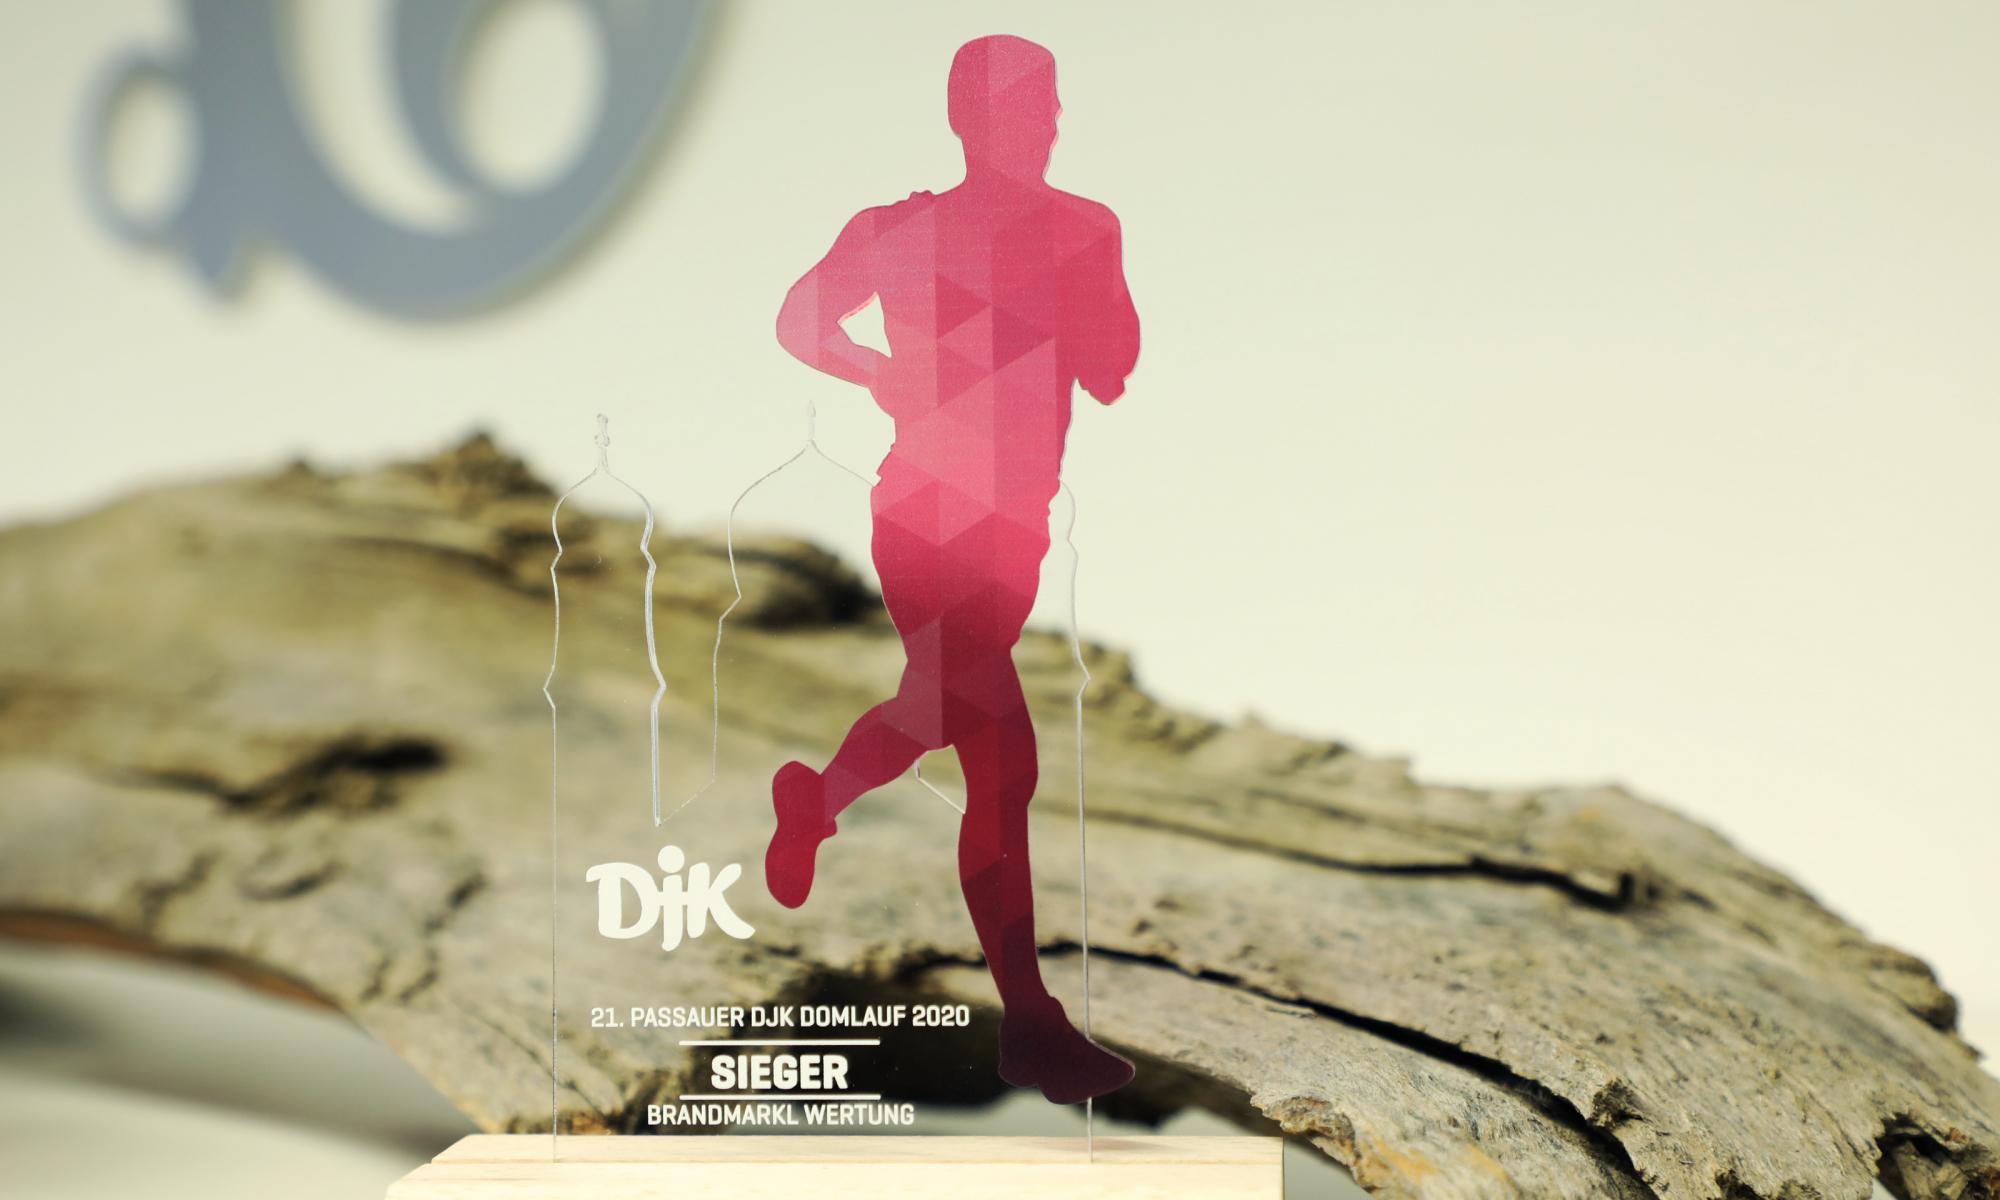 200309 DJK Domlauf Pokal foto5